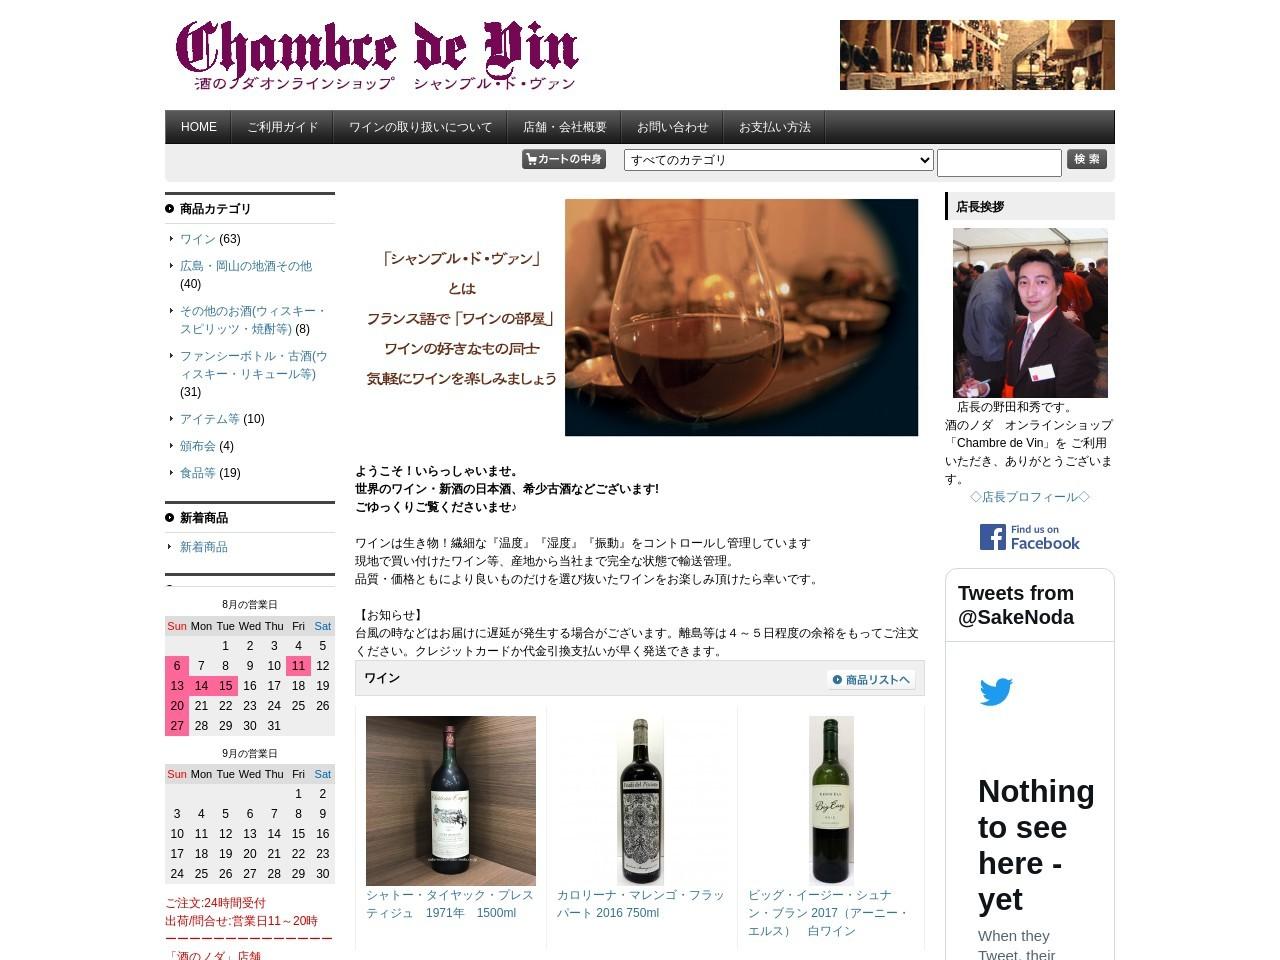 Chambre de Vin